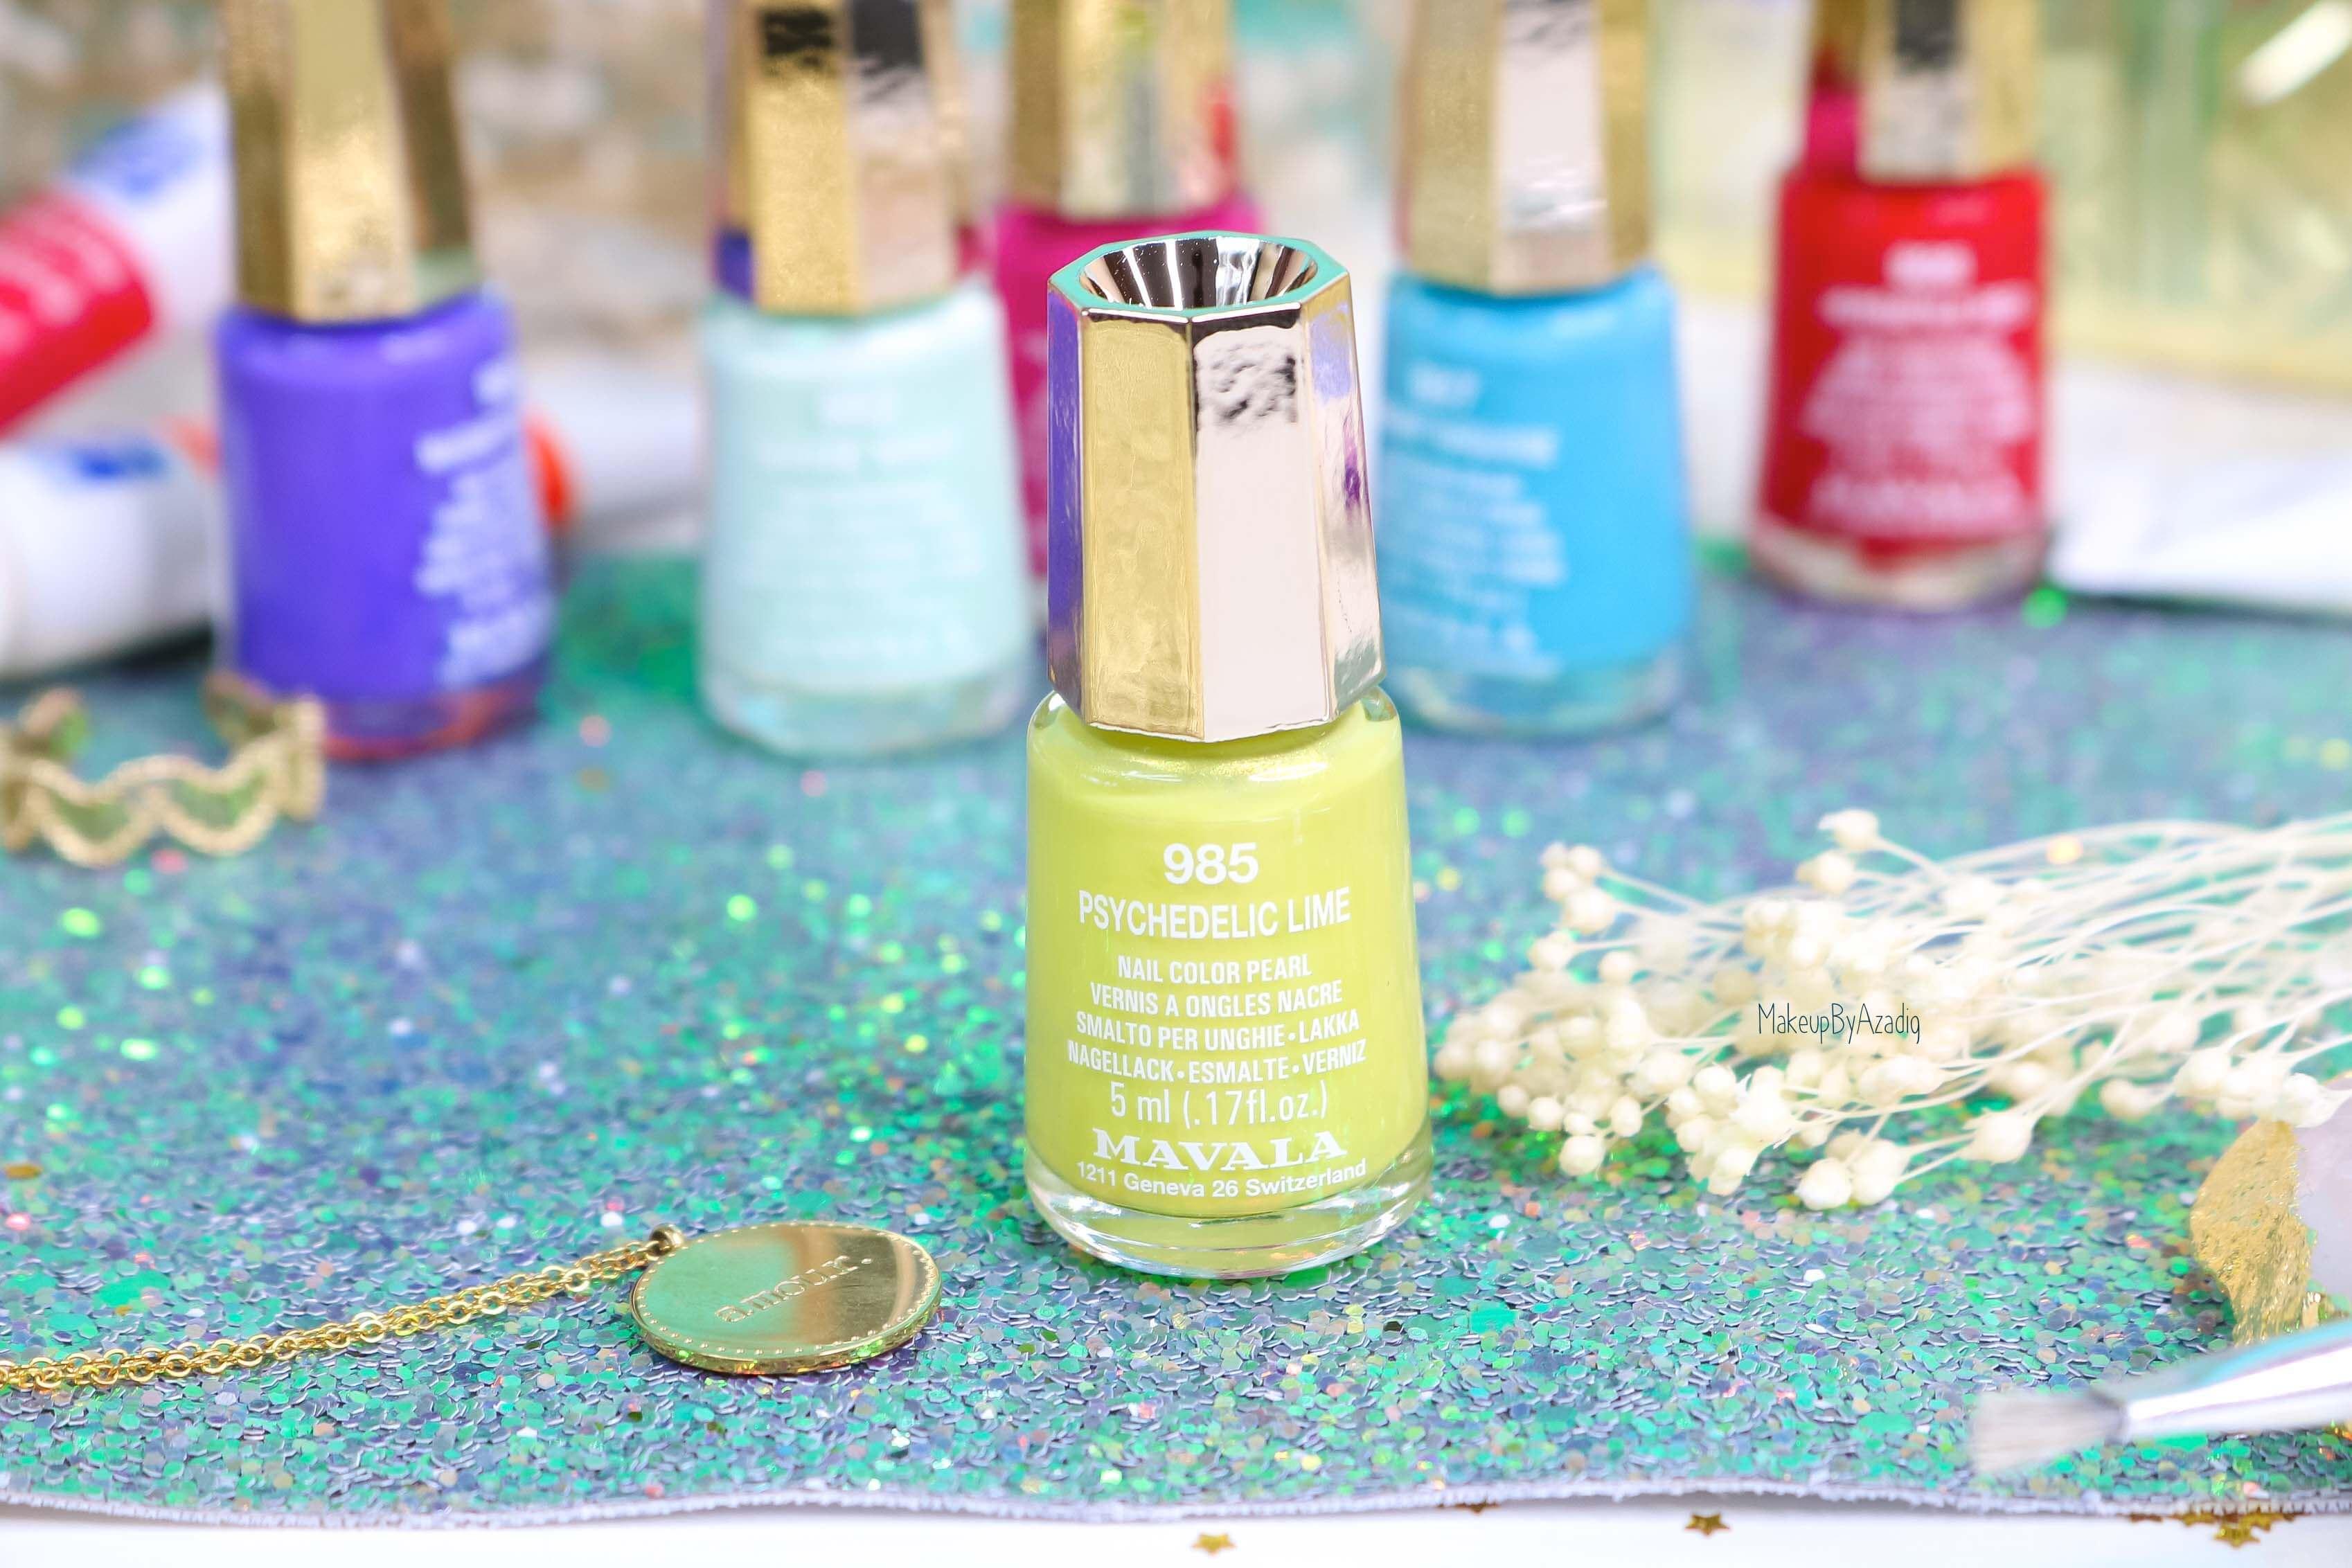 revue-collection-vernis-mavala-nails-dash-splash-ete-2019-bleu-orange-makeupbyazadig-swatch-avis-prix-lime